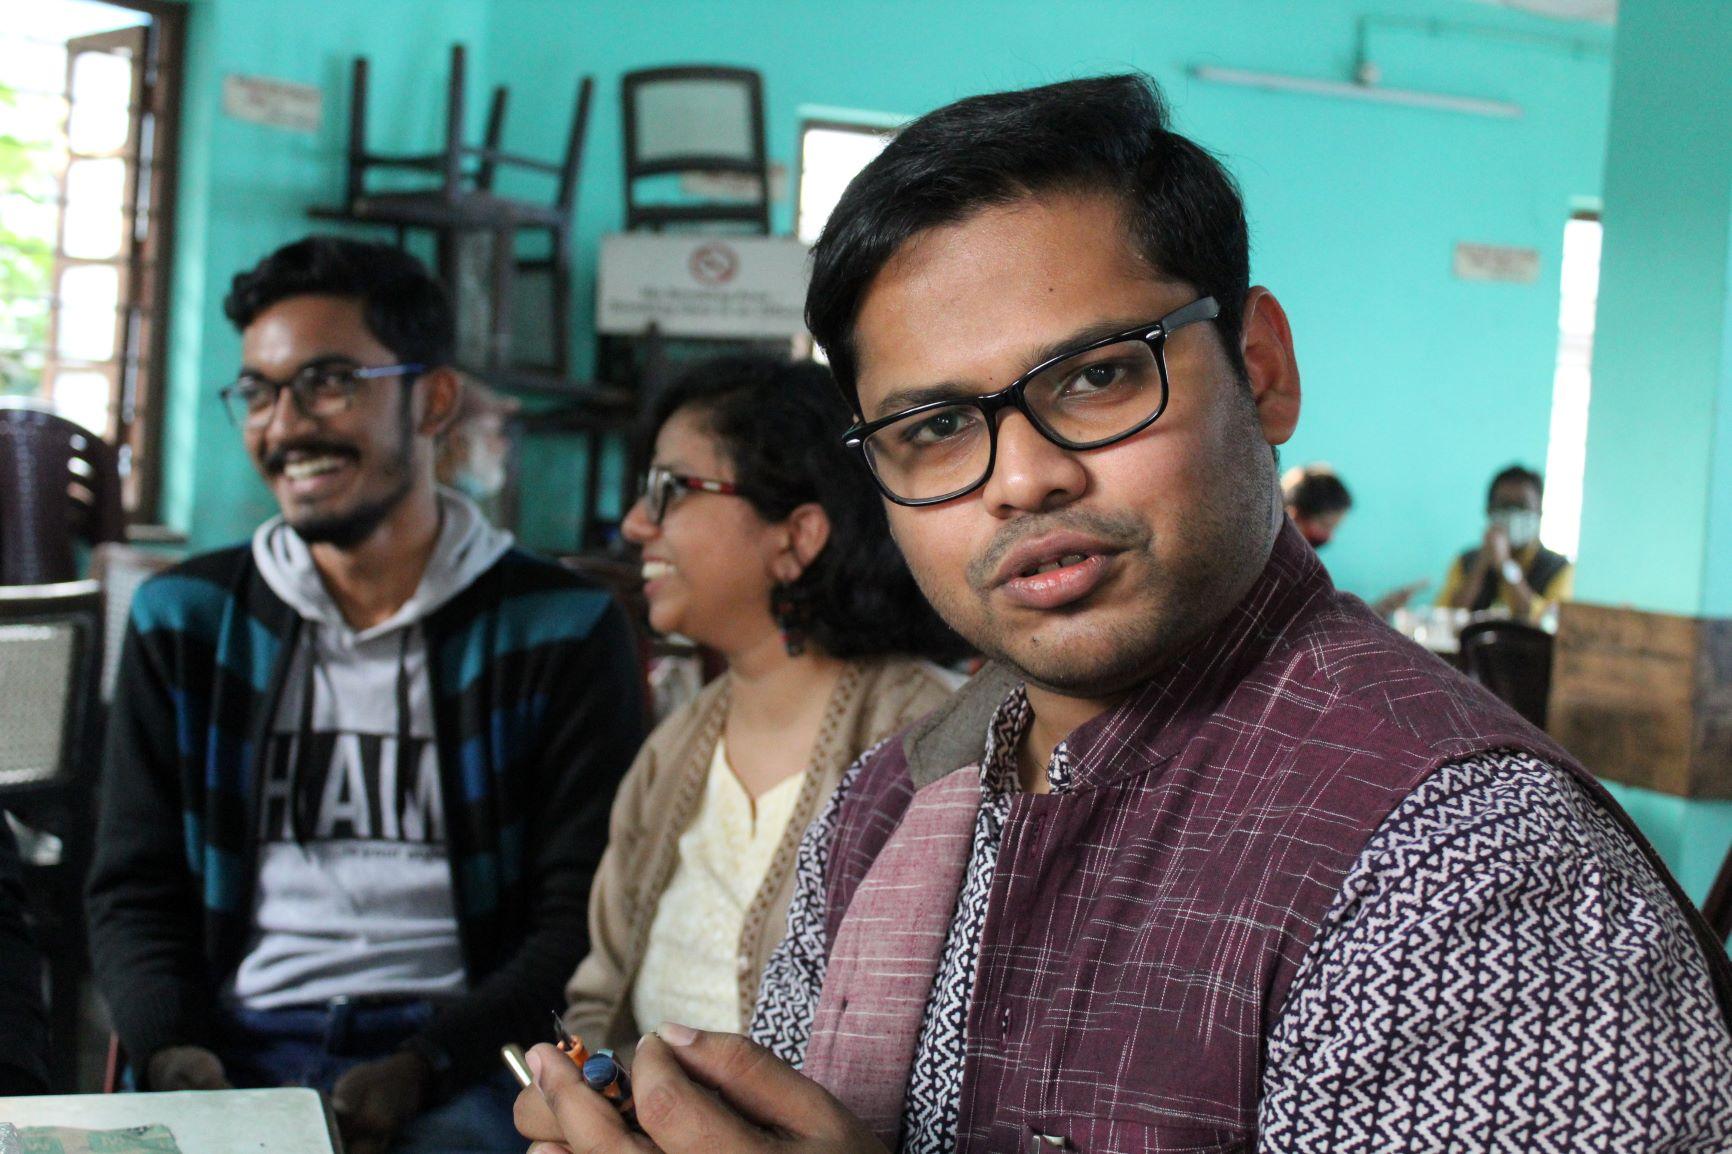 Maanjitender Sethi a Pen meet and the spirit of giving